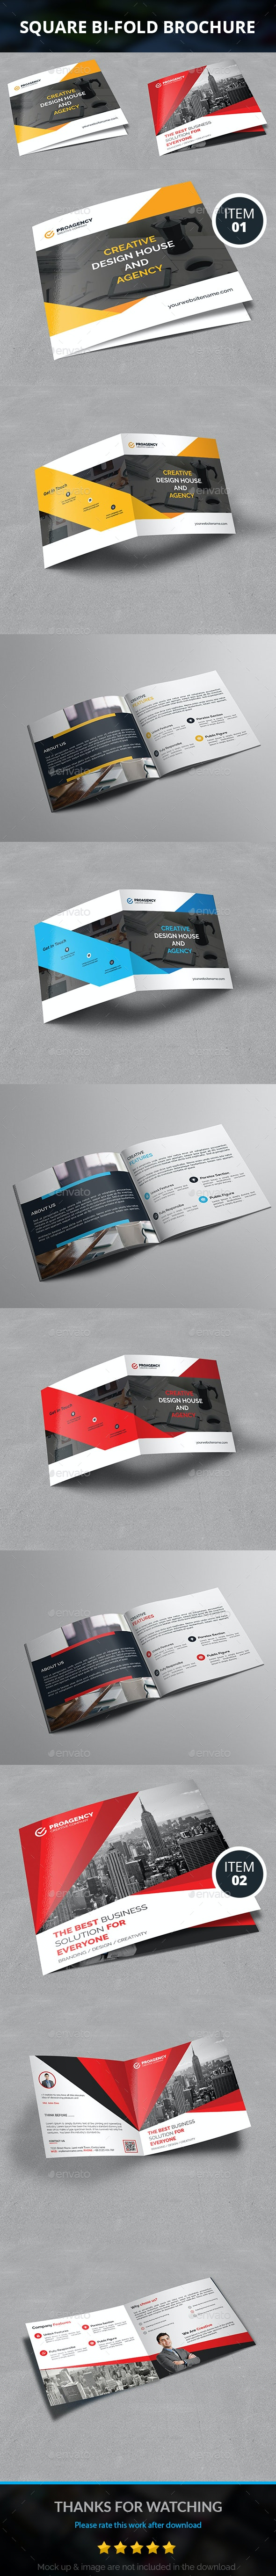 Square Bifold Brochure Bundle - Corporate Brochures